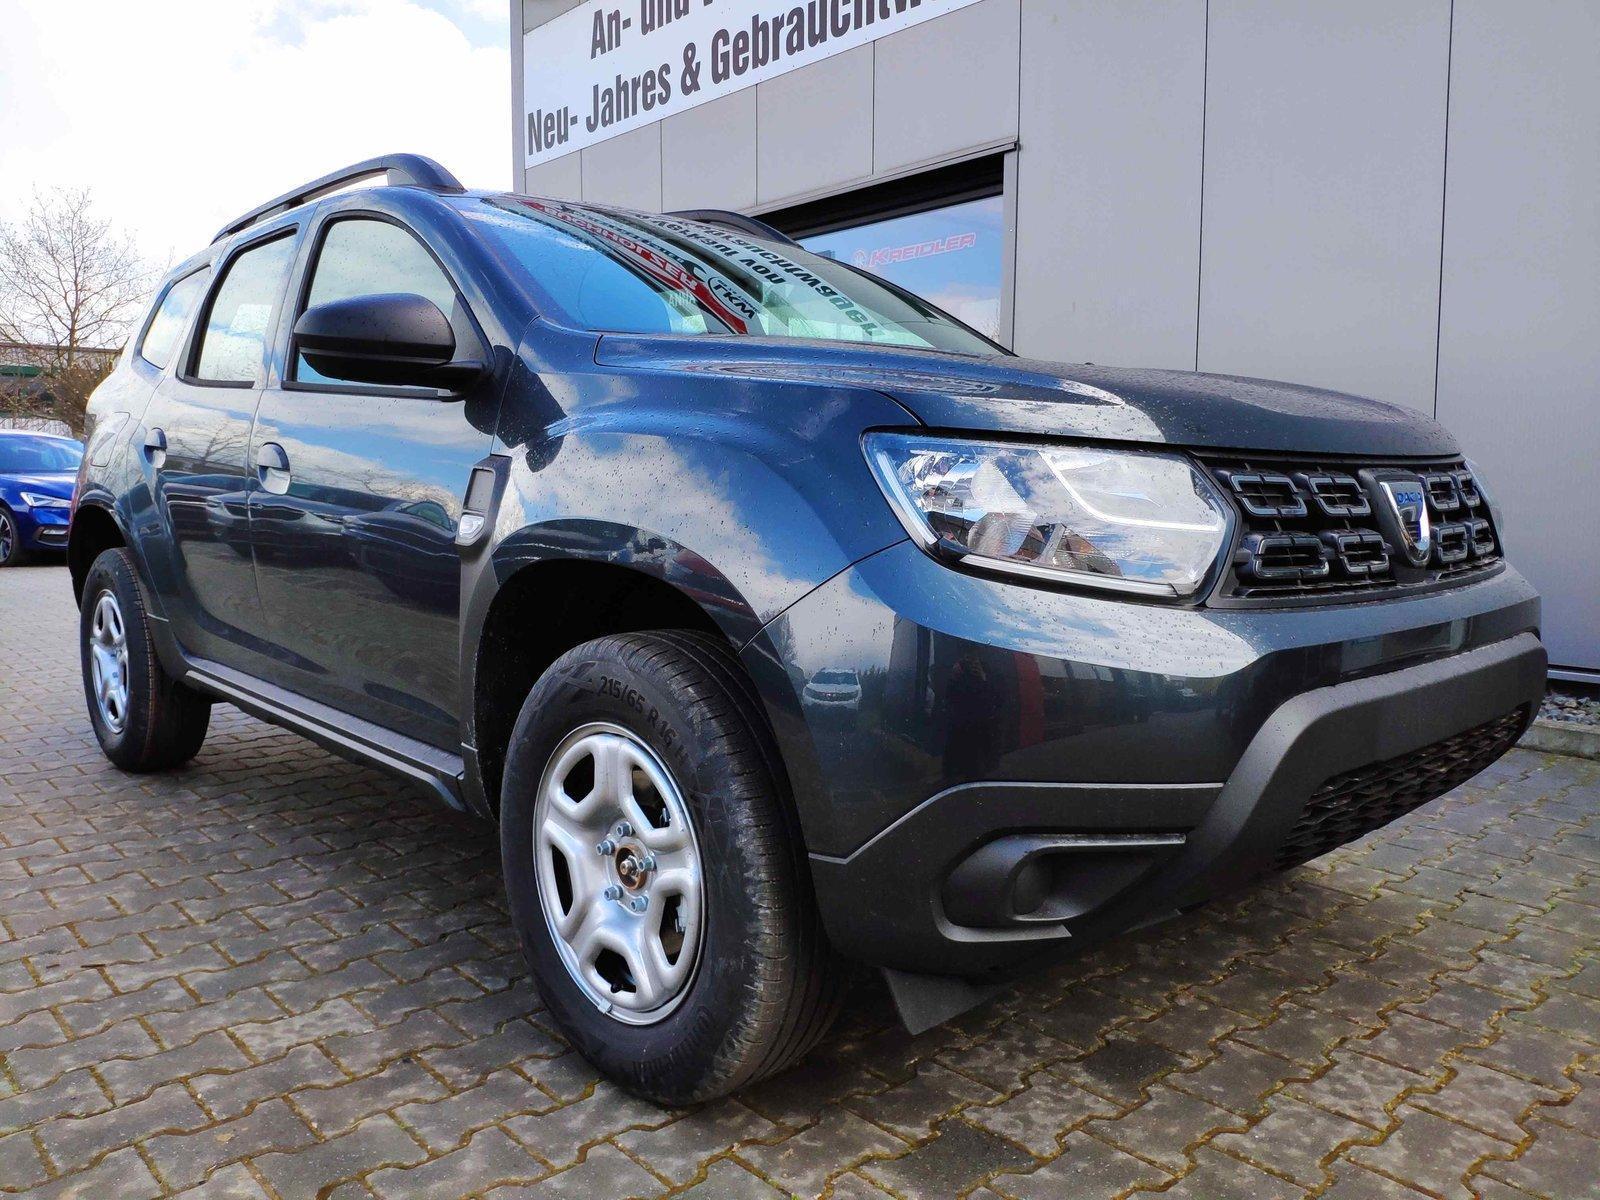 Dacia Duster Diesel 2021 Klima*Bluetooth*ZV-Funk uvm